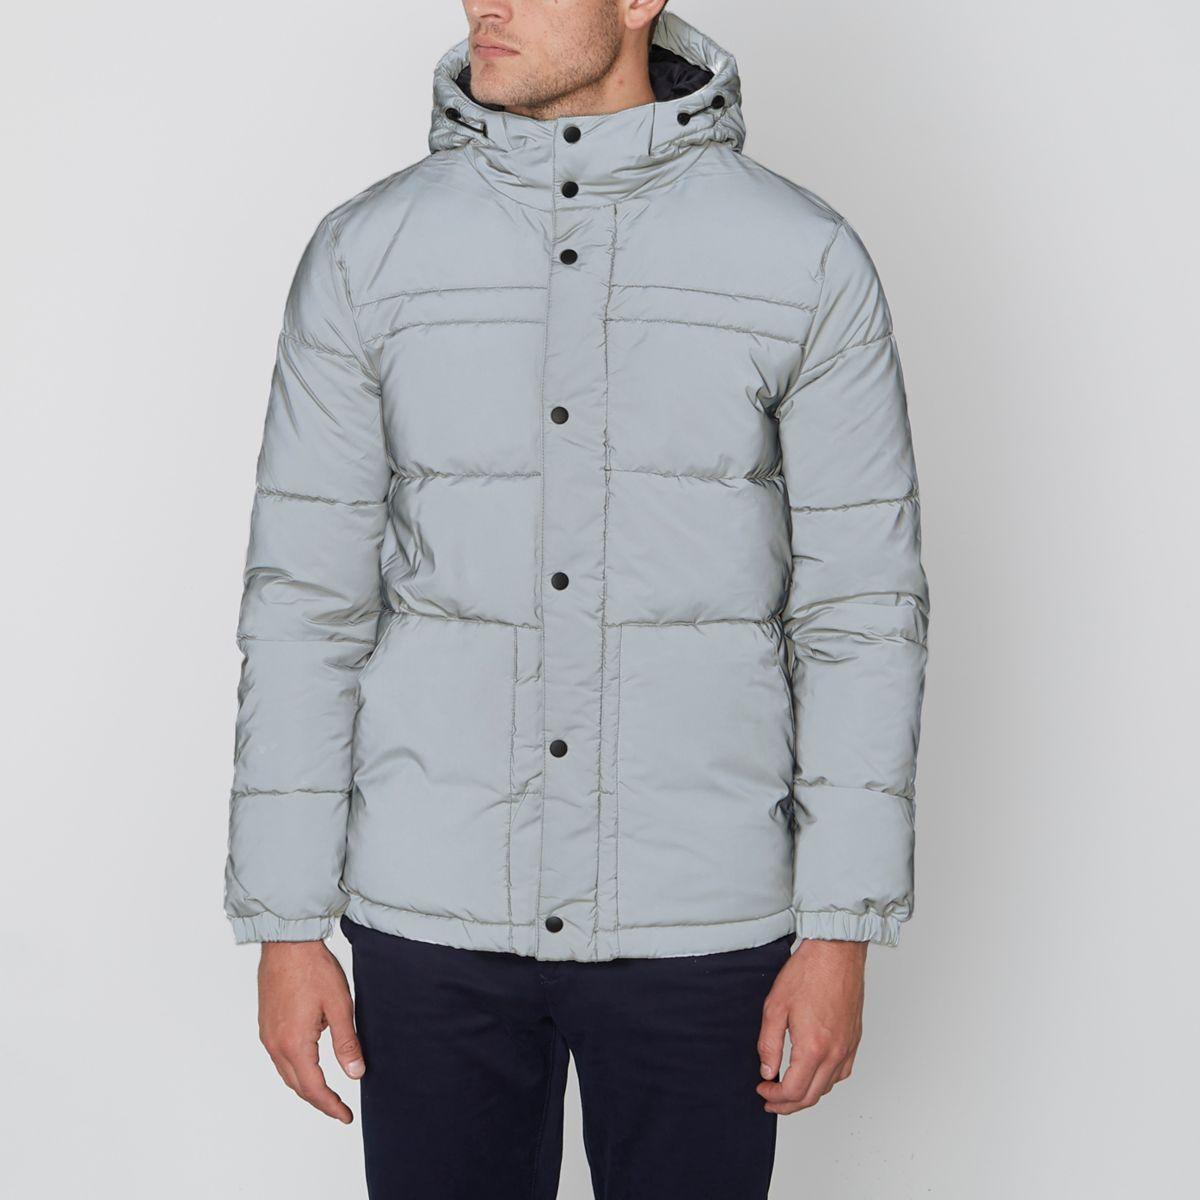 Grey Jack & Jones Core reflective jacket